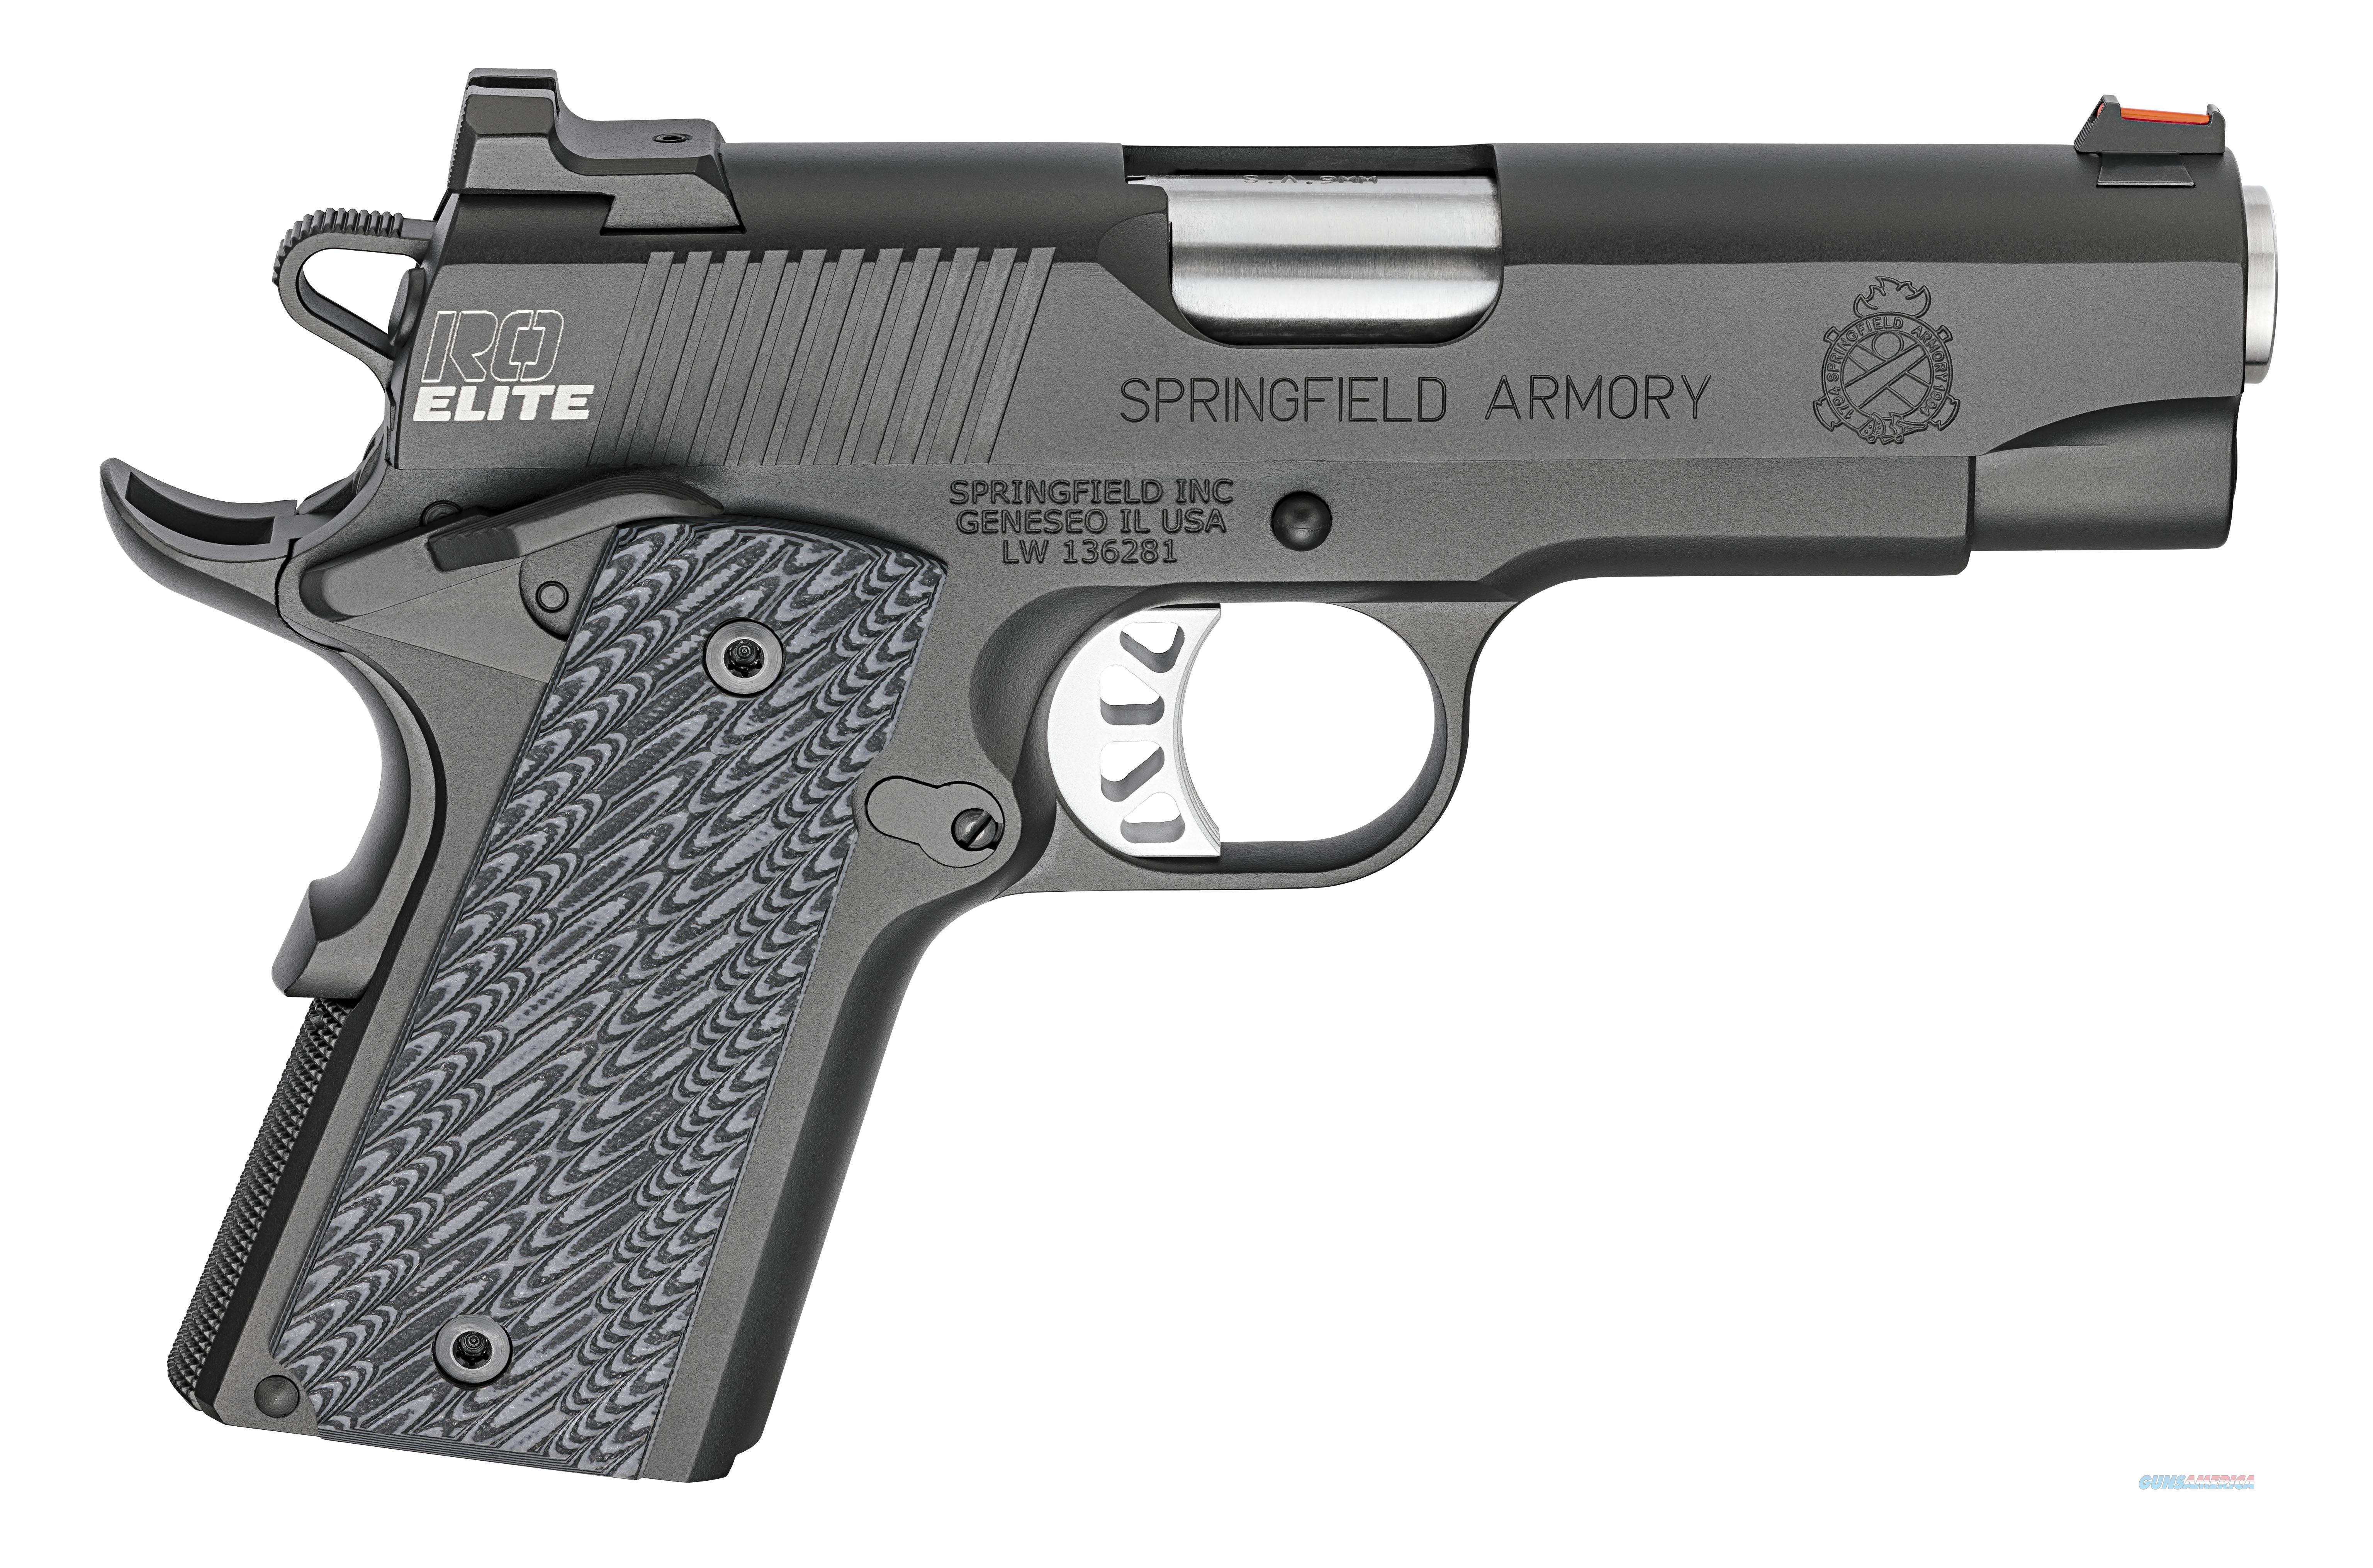 "Springfield 1911 Range Officer Elite Champion .45 ACP 4"" PI9136E   Guns > Pistols > Springfield Armory Pistols > 1911 Type"